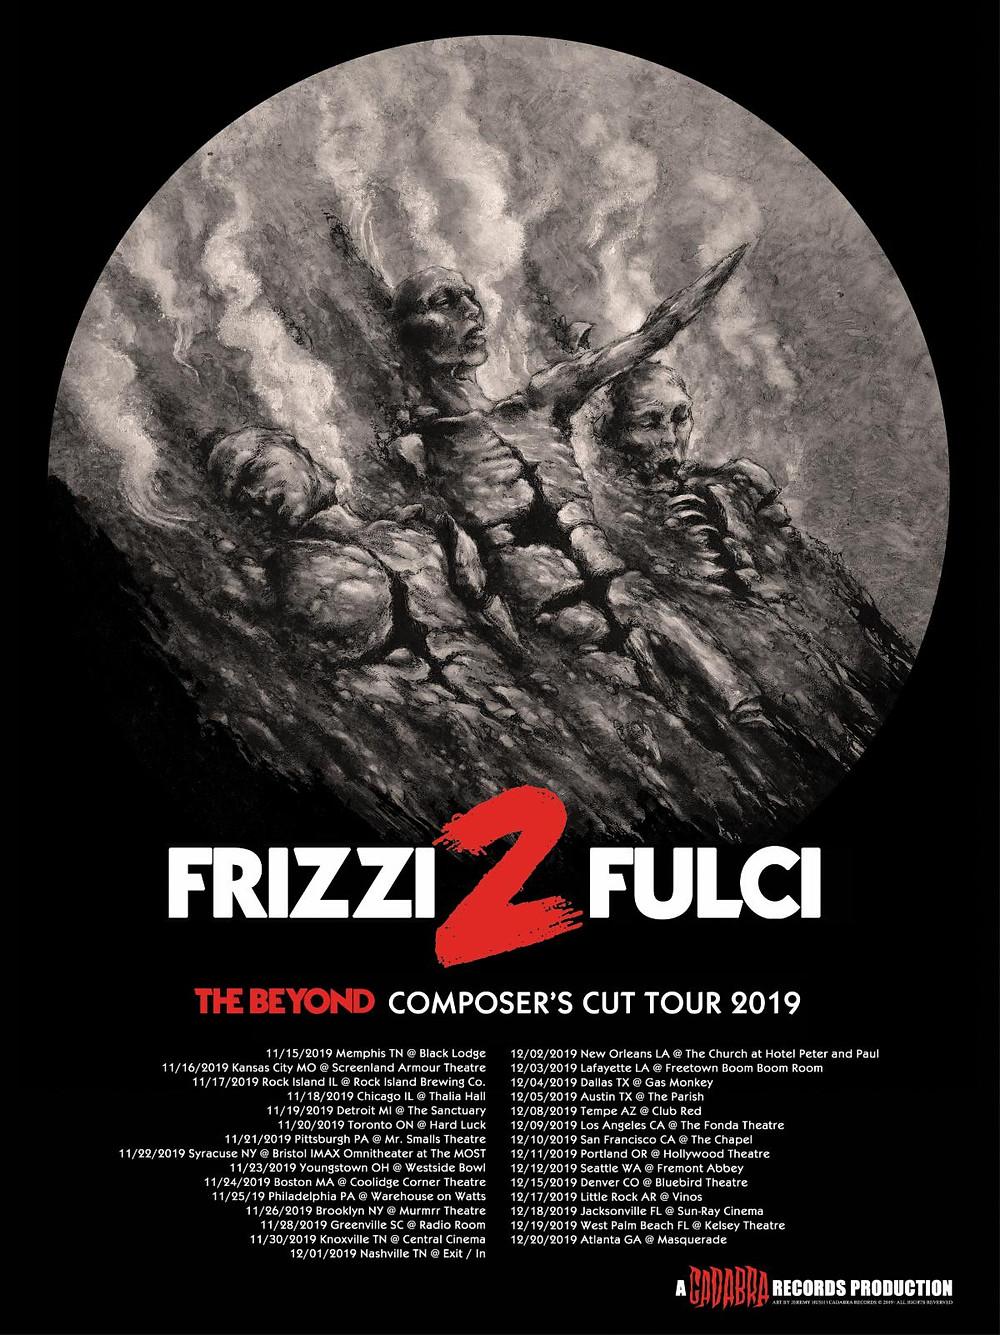 Frizzi 2 Fulci, The Beyond Composer's Cut Tour 2019